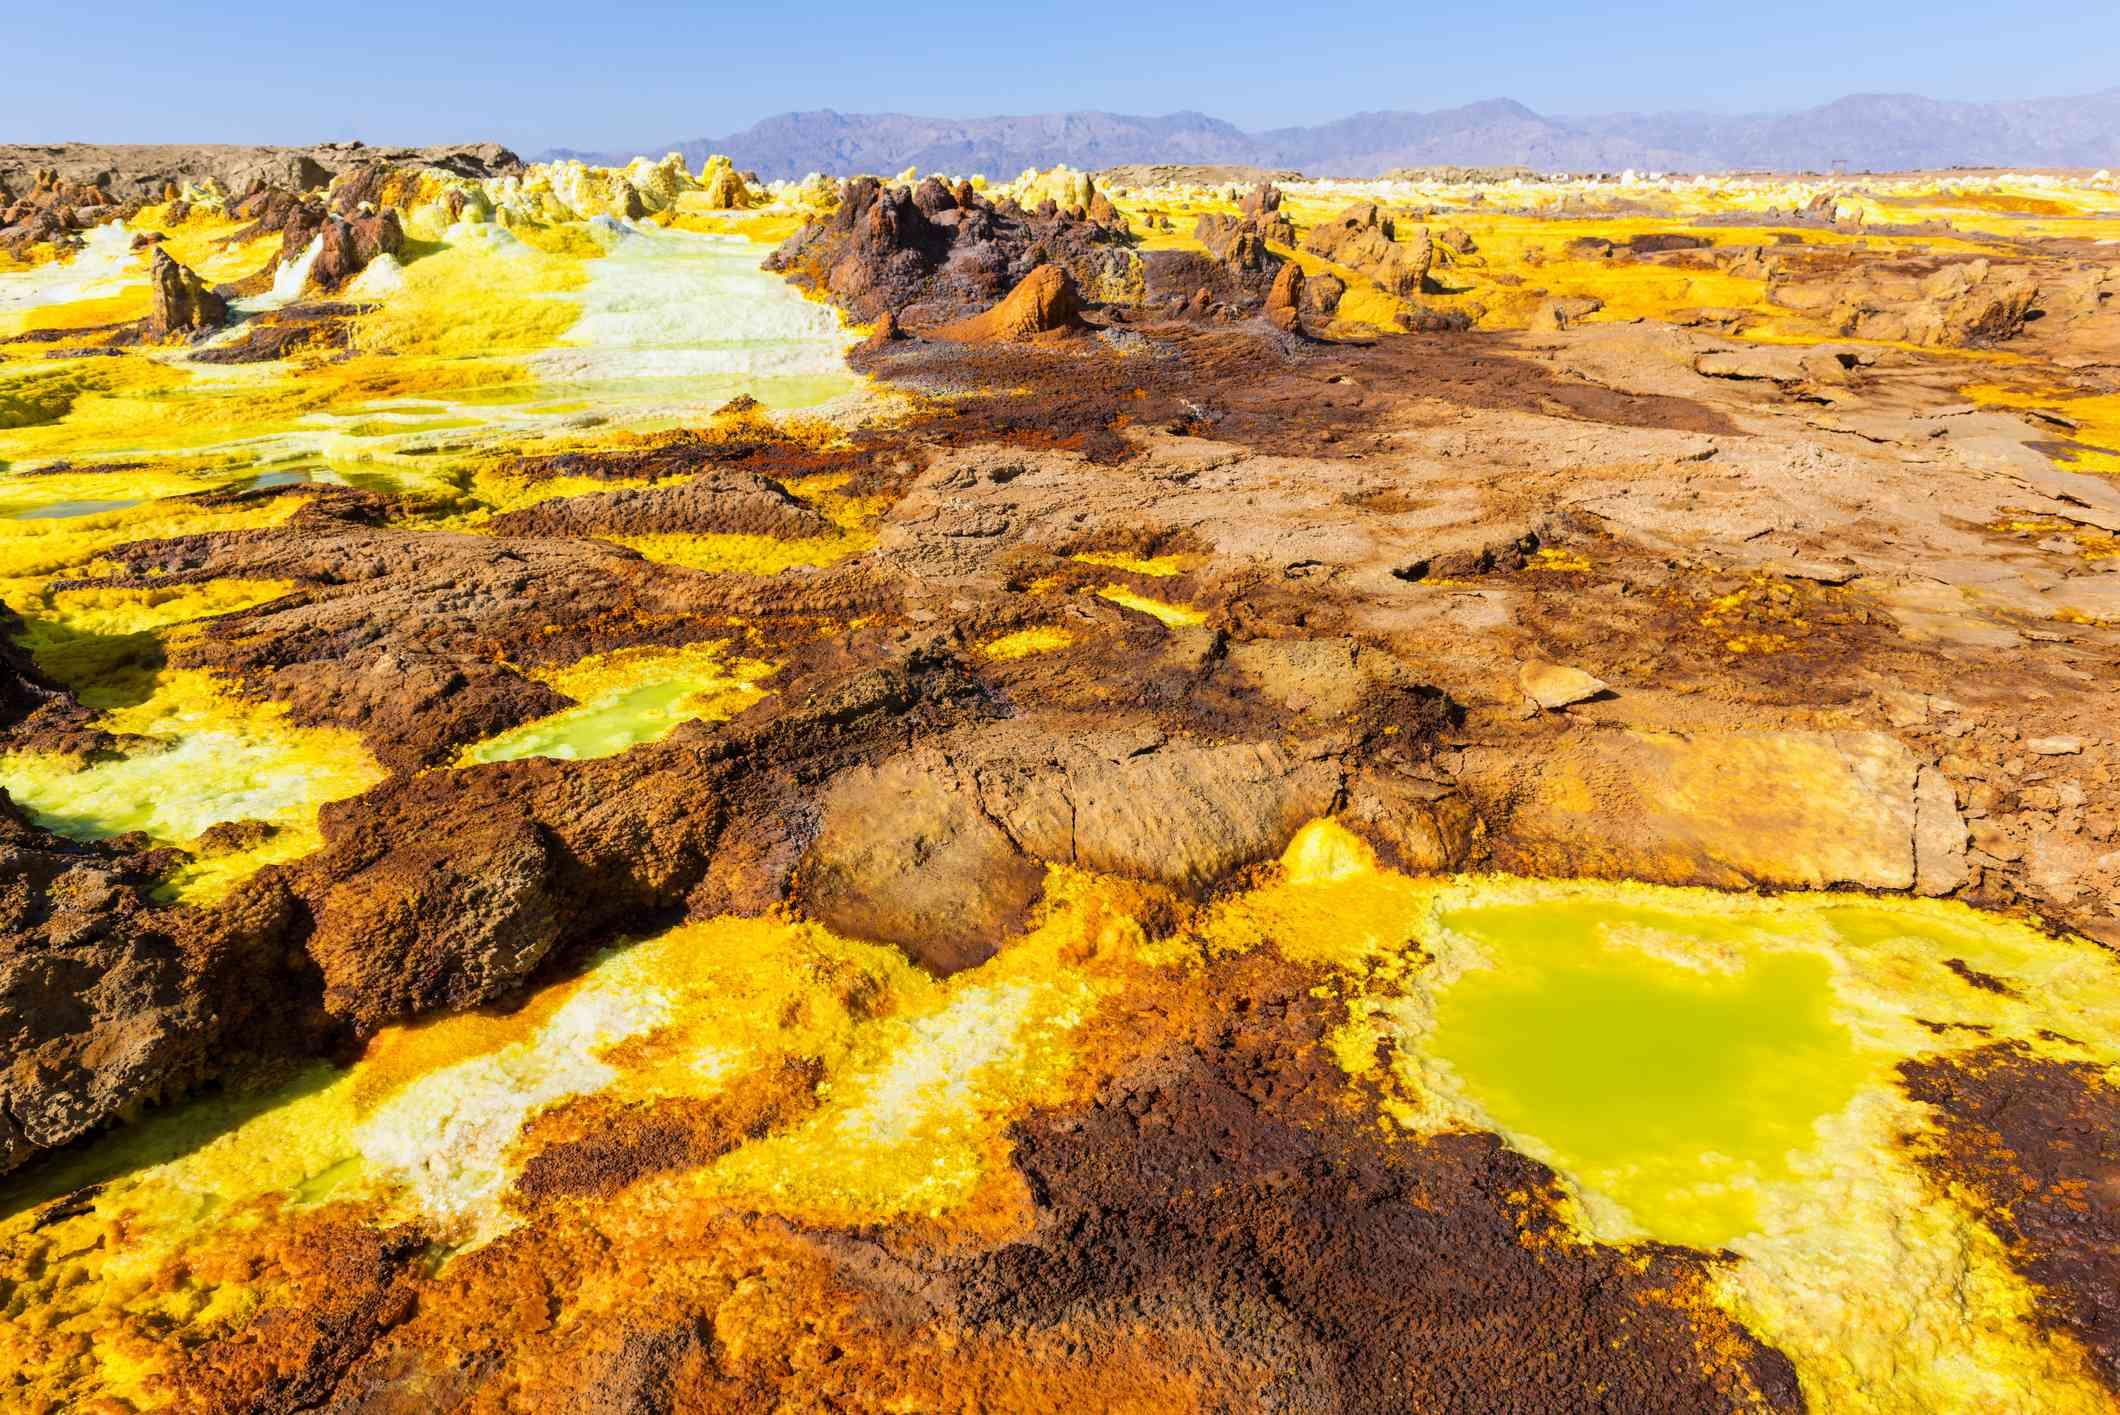 Hot springs in the Danakil Depression, Ethiopia